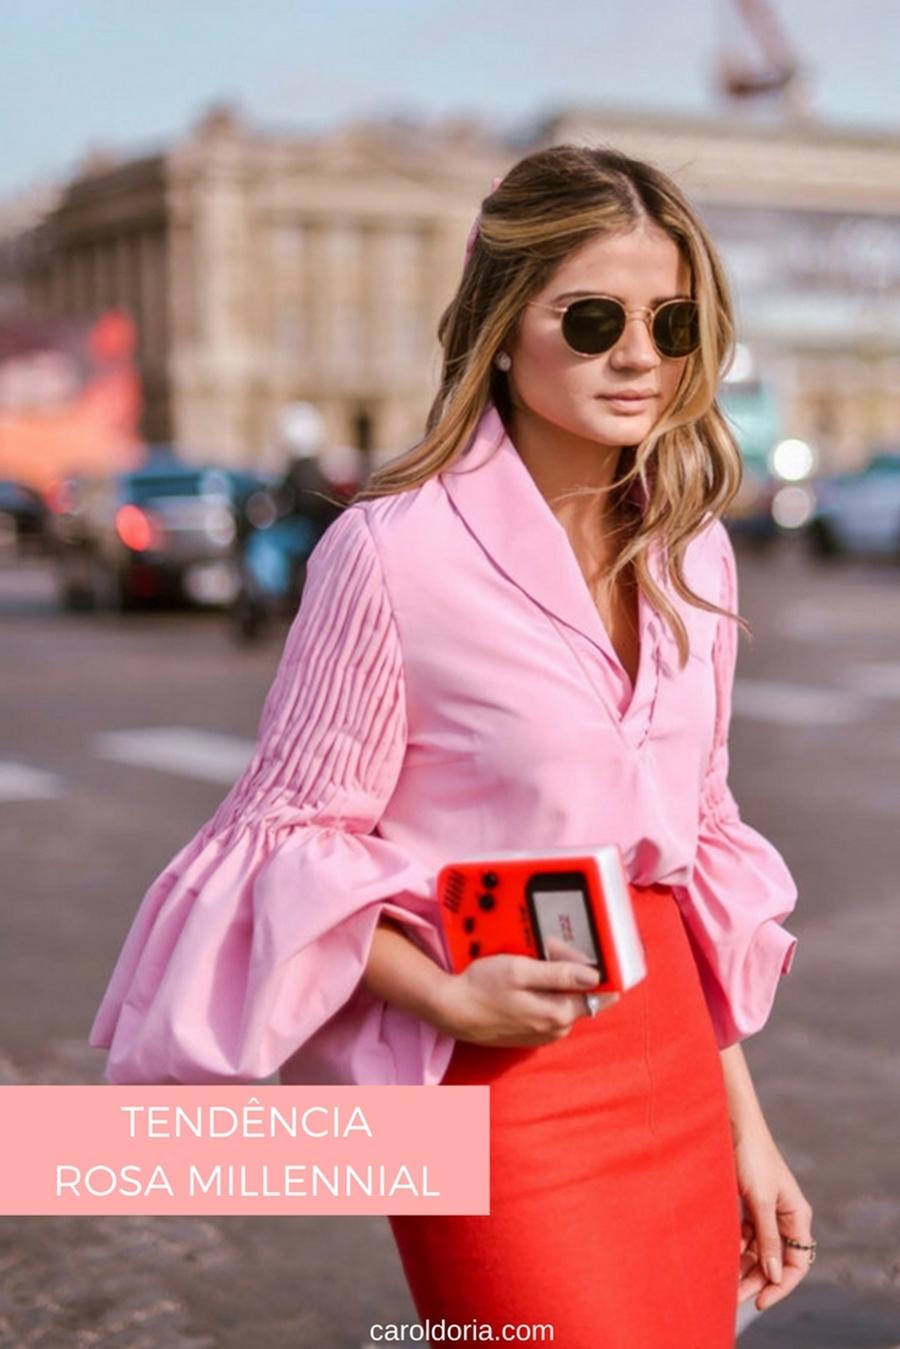 tendencia rosa millennial